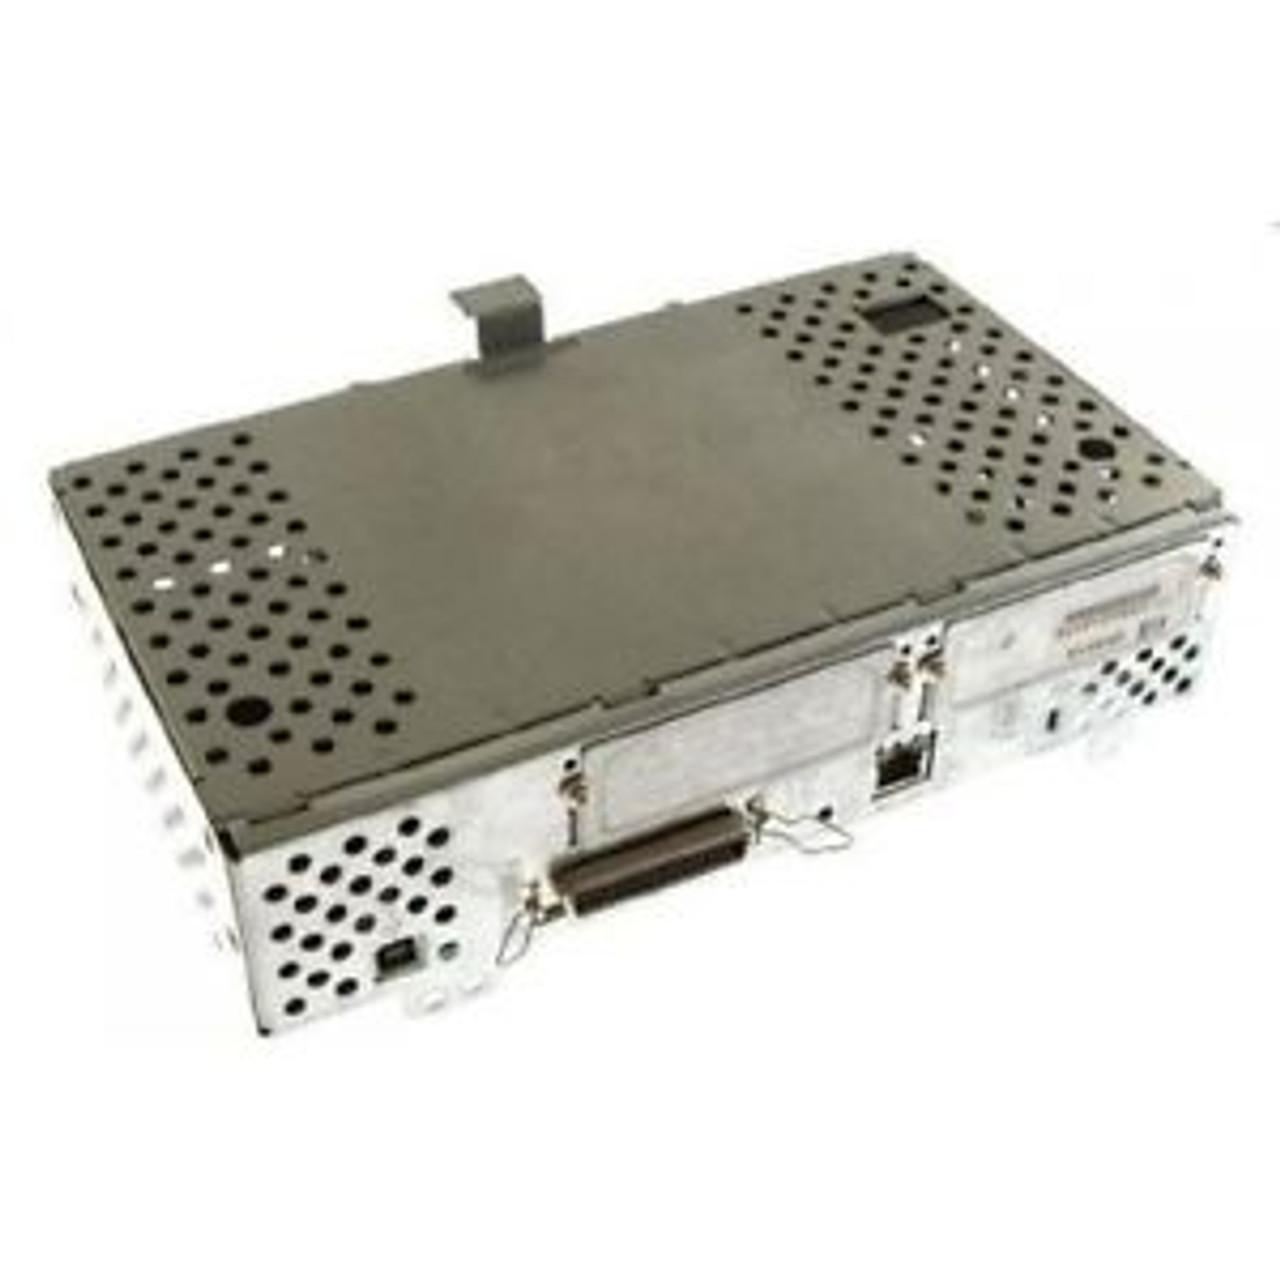 HP 4250/4350 Formatter Board - Q6505-69010 -